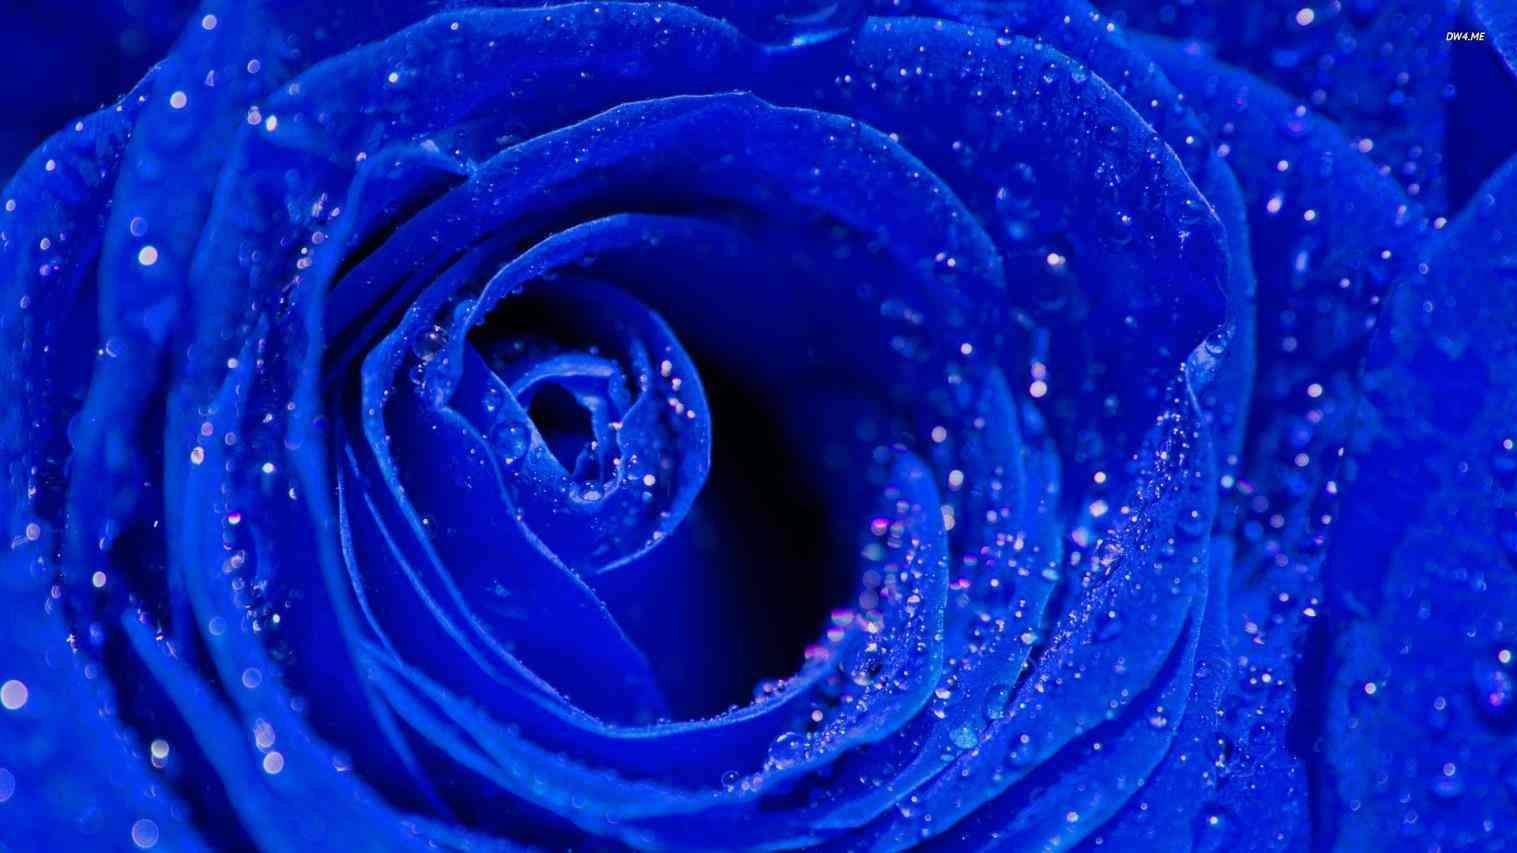 40 Best Free Royal Blue Flowers Hd Wallpapers Wallpaperaccess